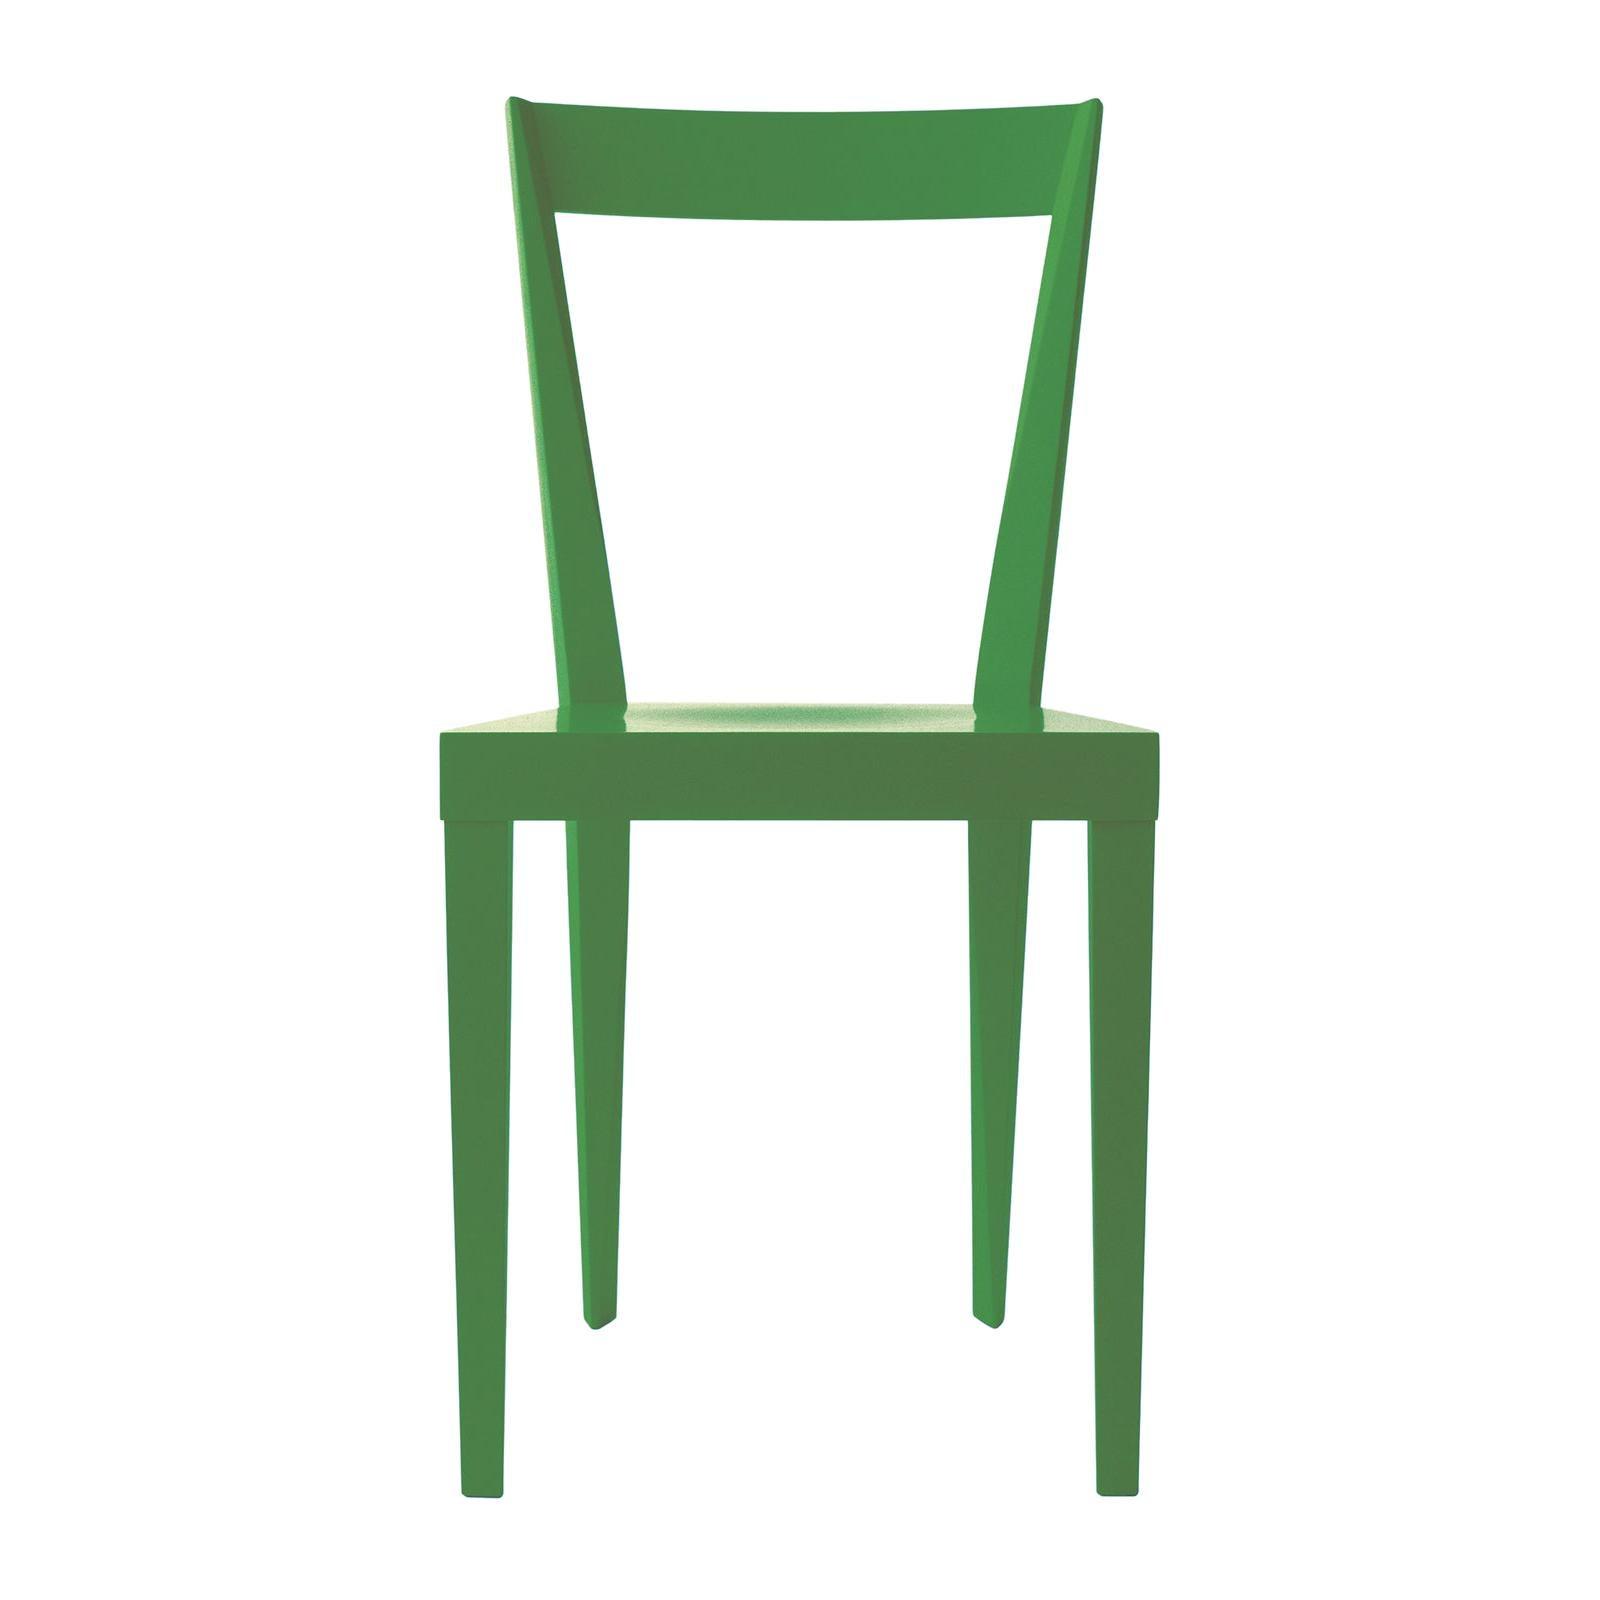 Set of 2 Livia Green Chairs by Giò Ponti